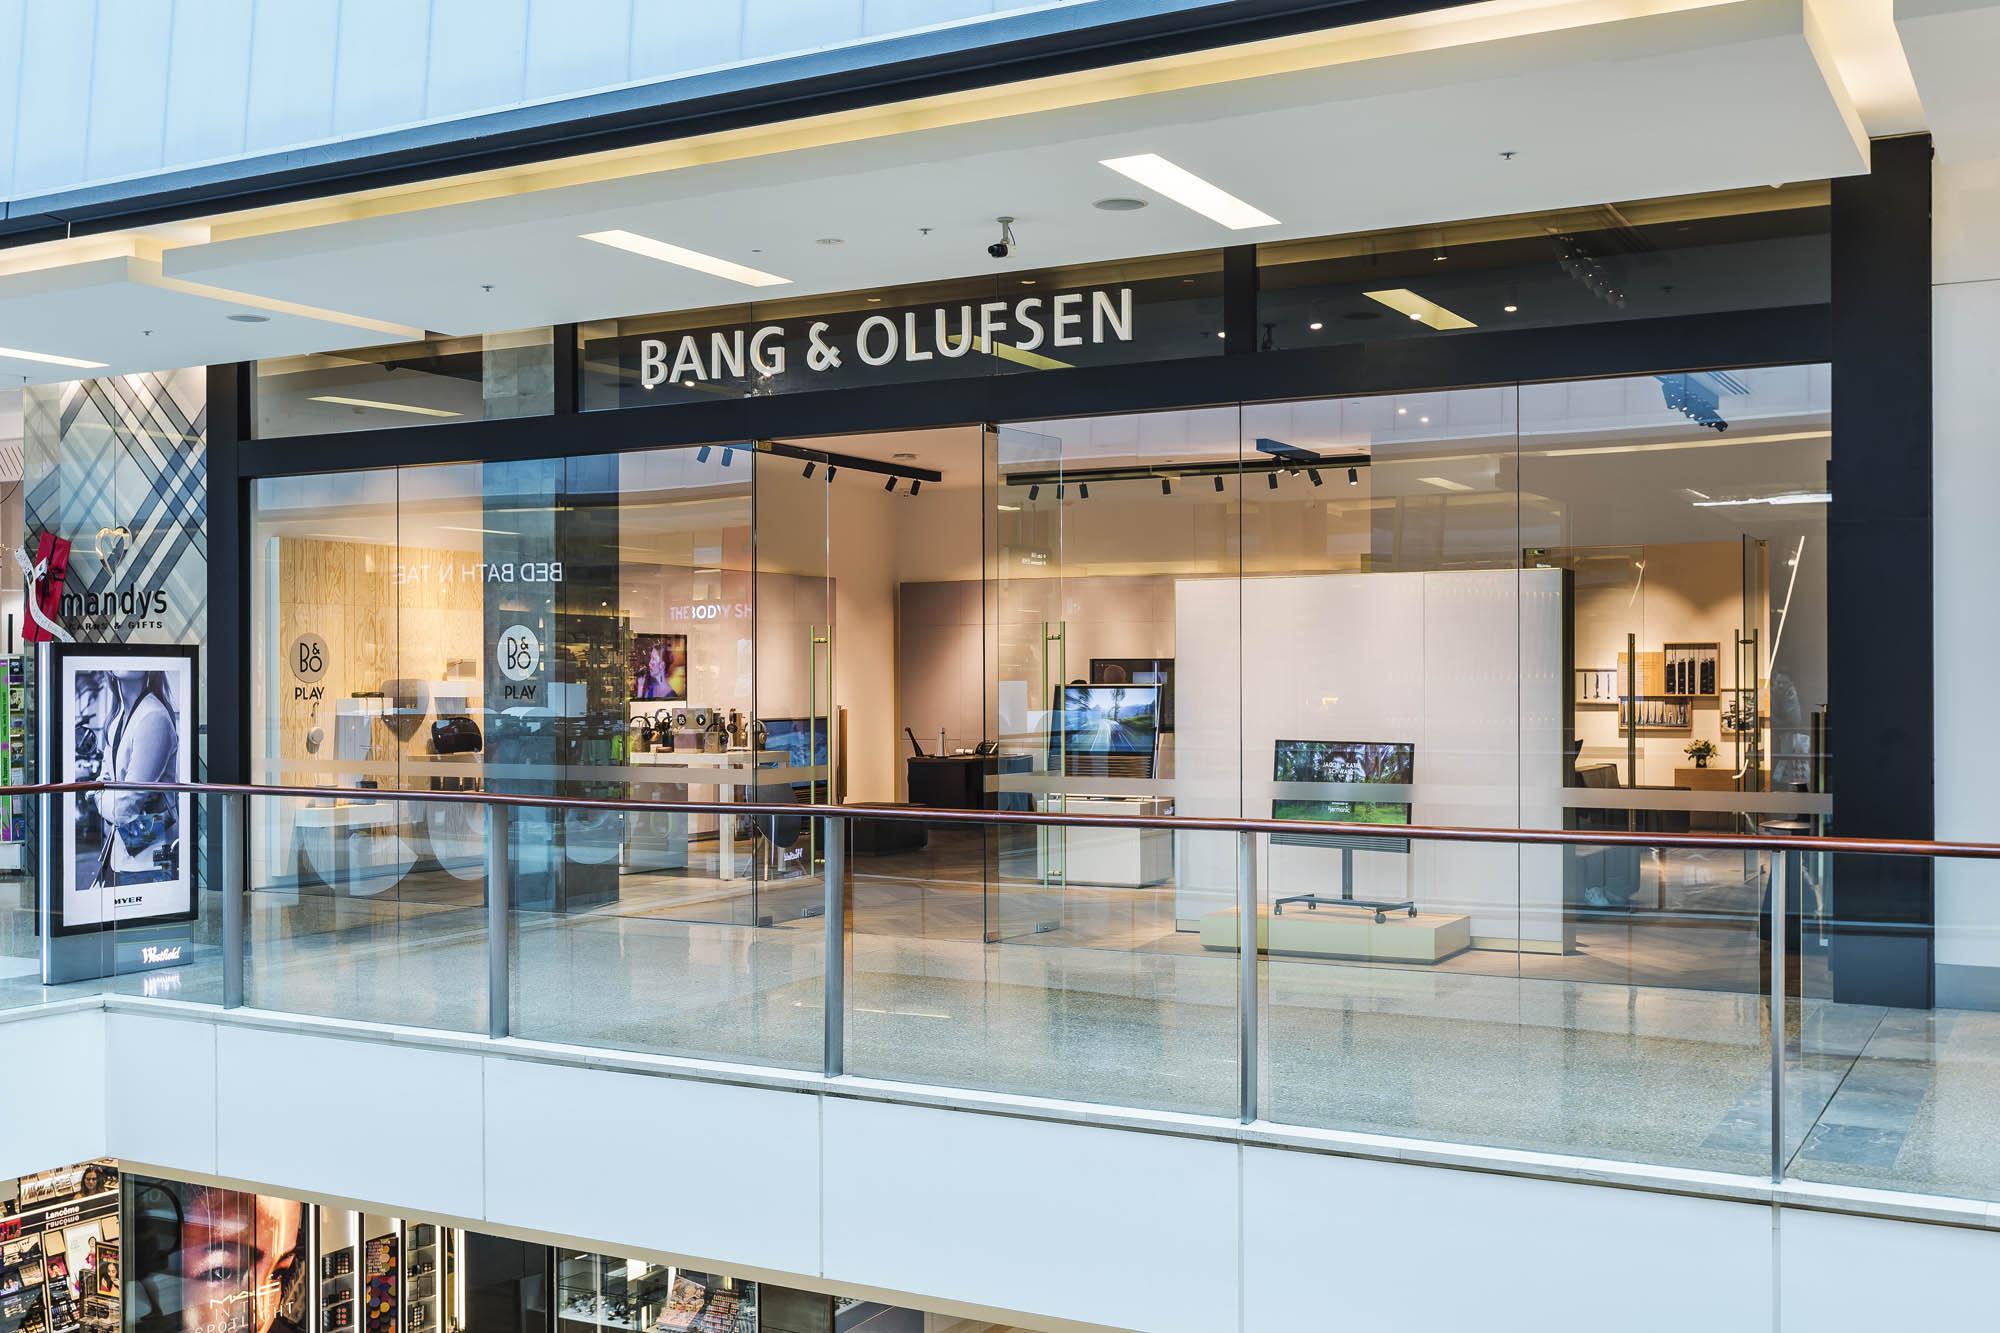 bang and olufsen retail sydney bondi showroom exterior signage shoppig centre